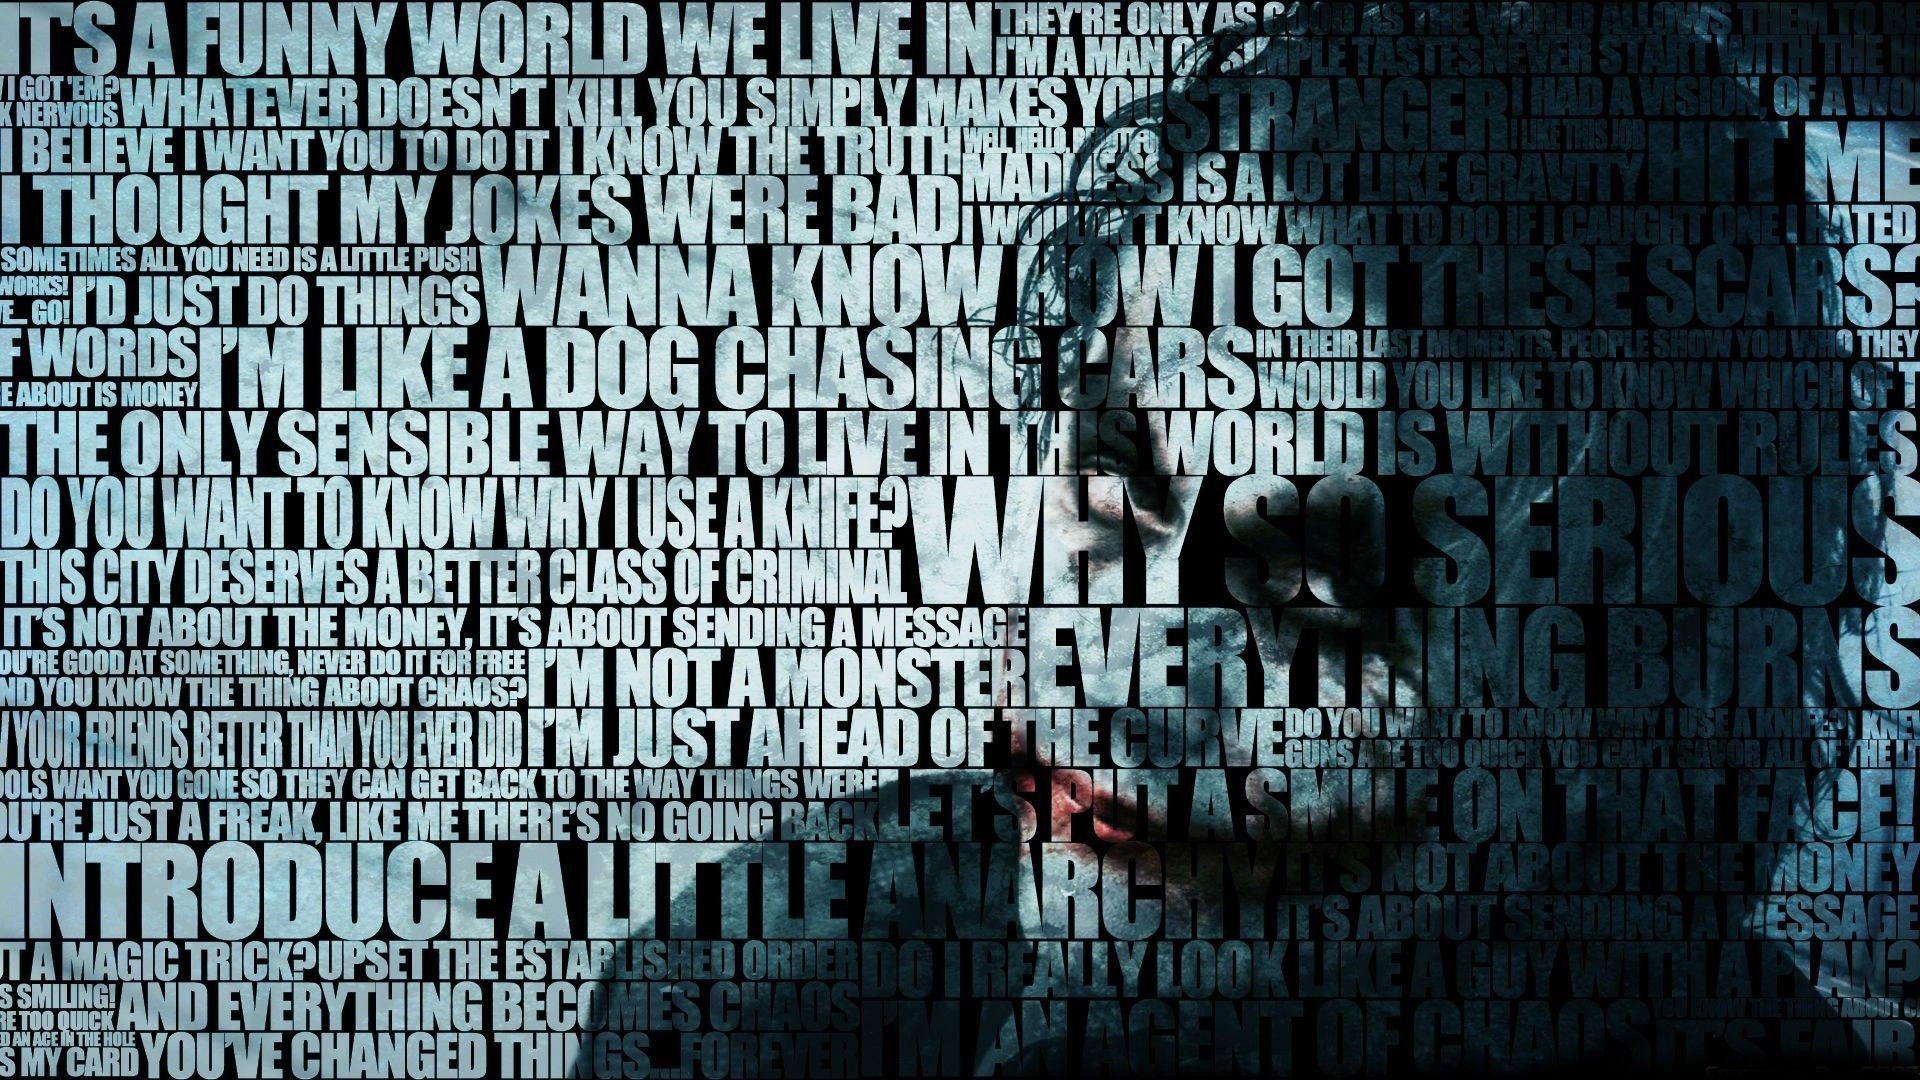 Click here to download in HD Format >> Batman Joker Card Wallpaper  https://www.superwallpapers.in/wallpaper/batman-joker-card-wallpaper-wal… |  Pinteres…